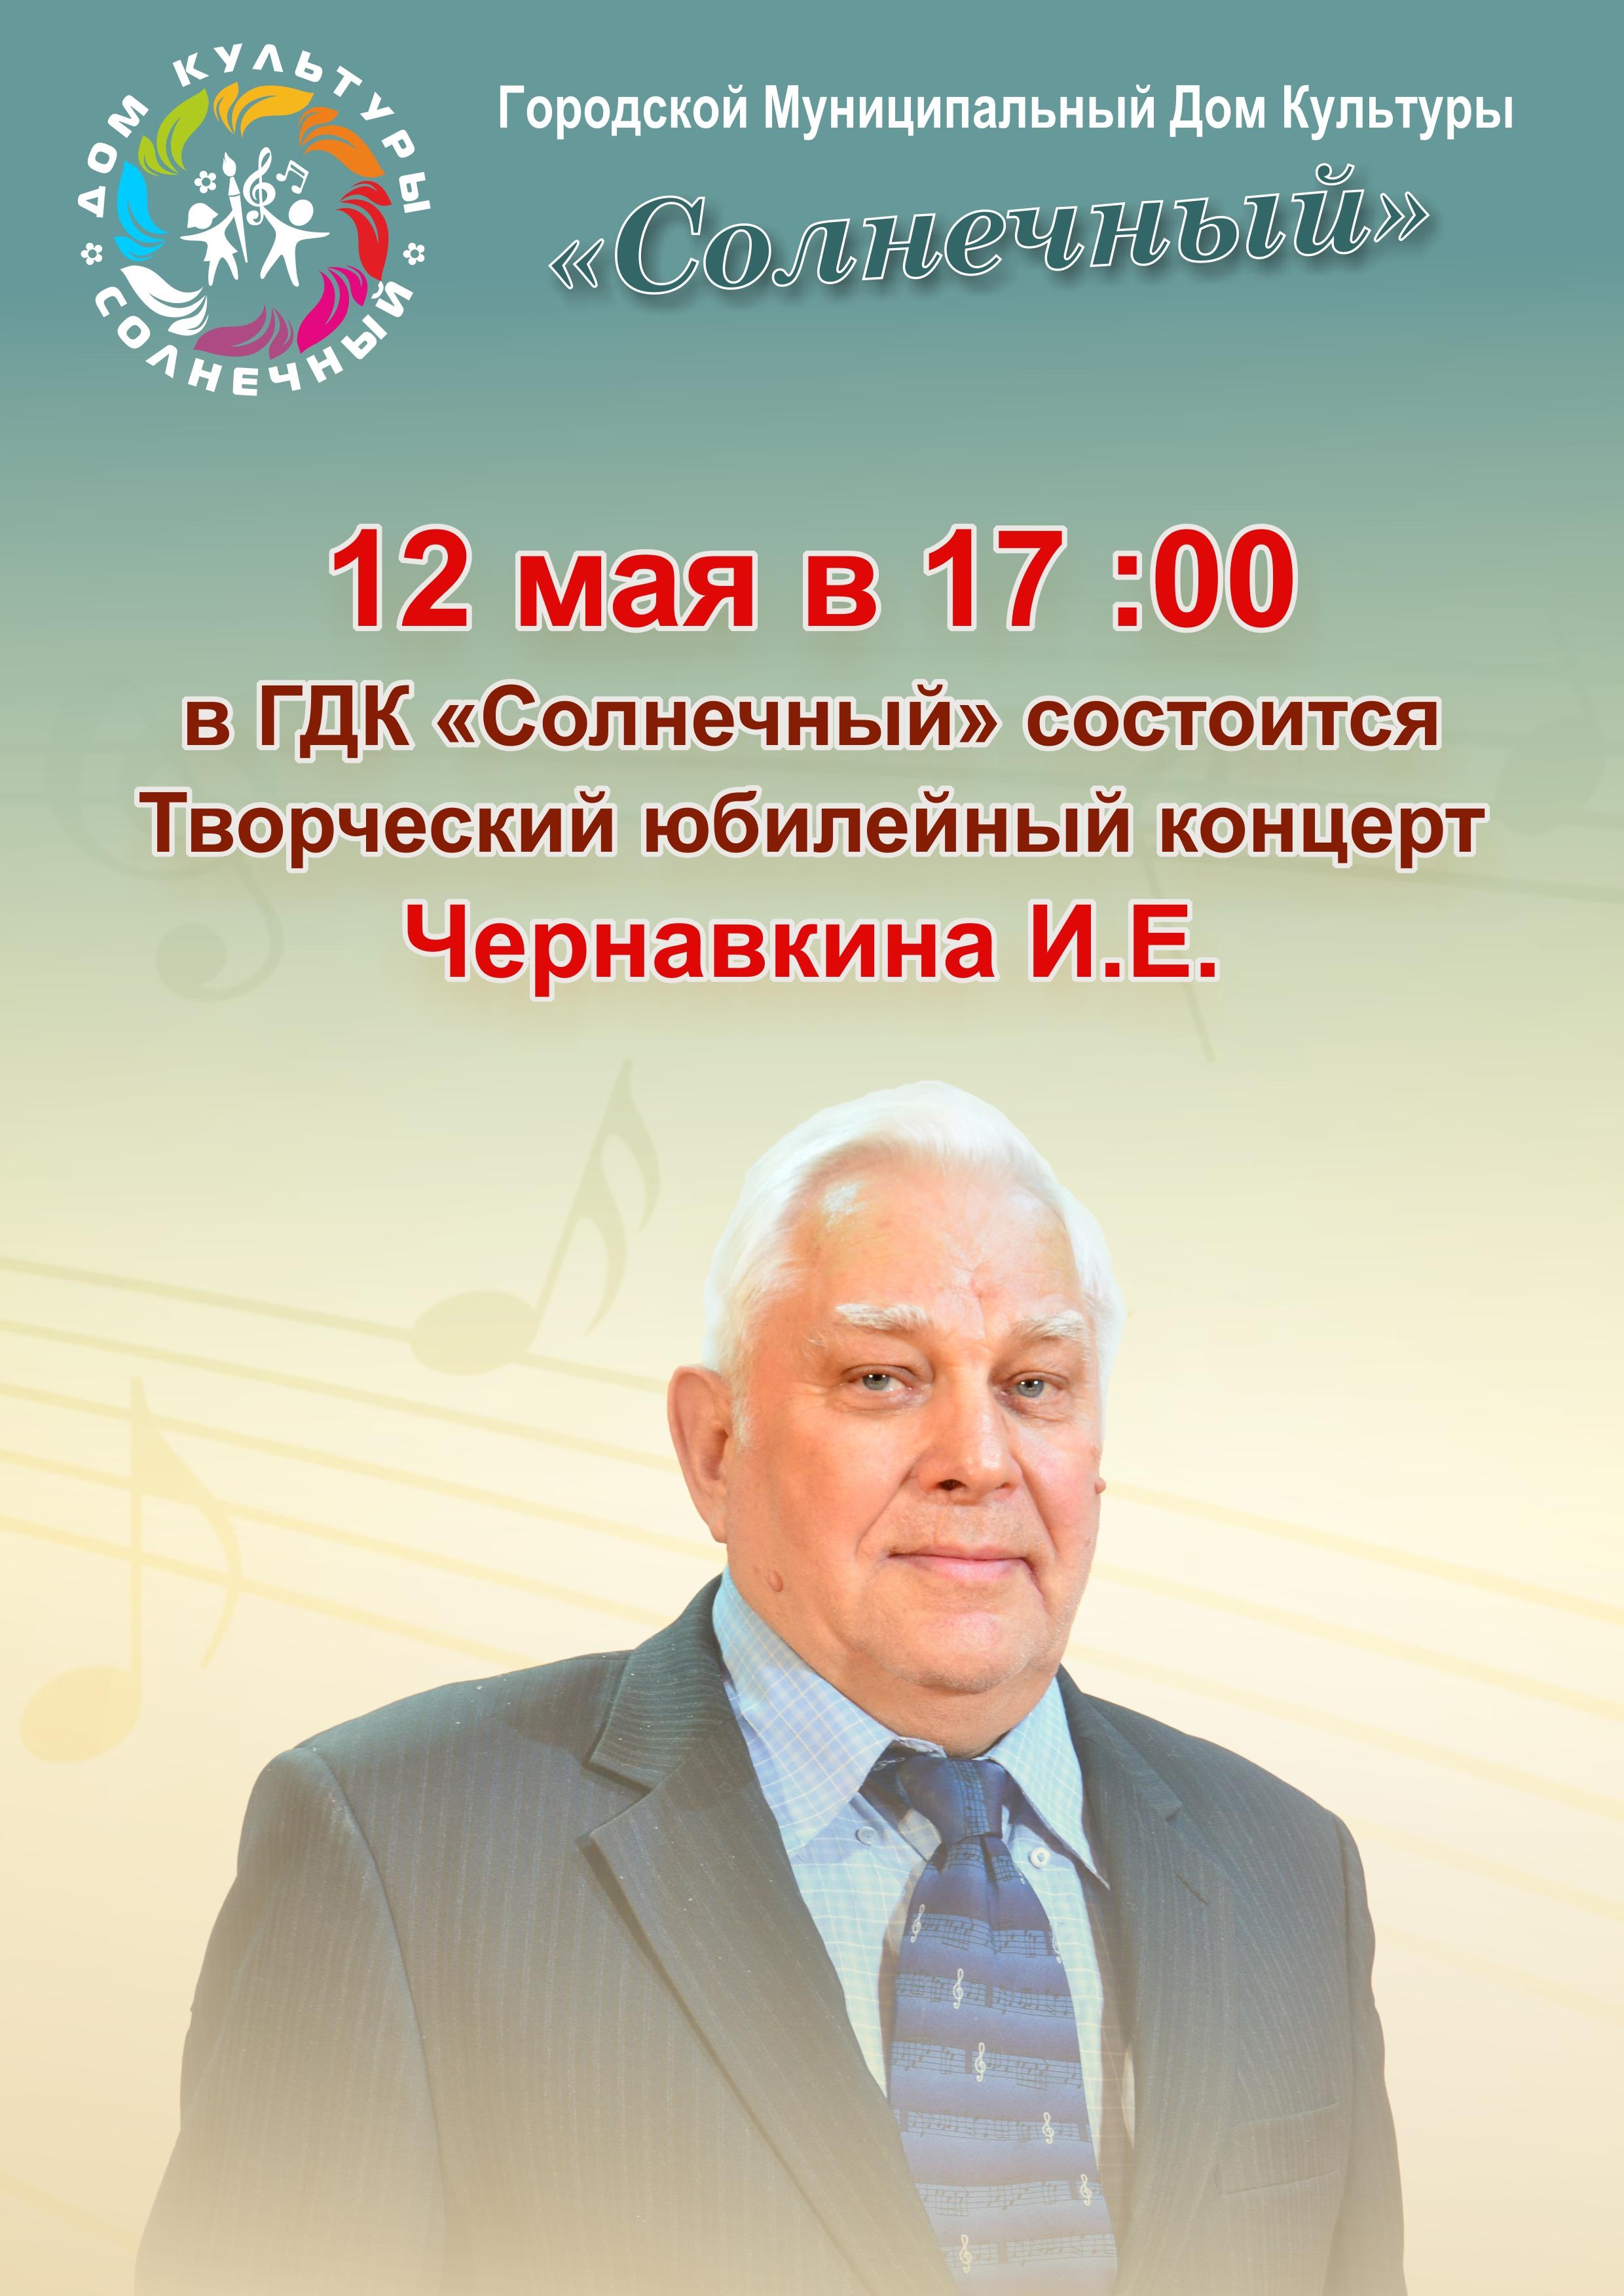 Solnechny-OFISHA-Chernavkin